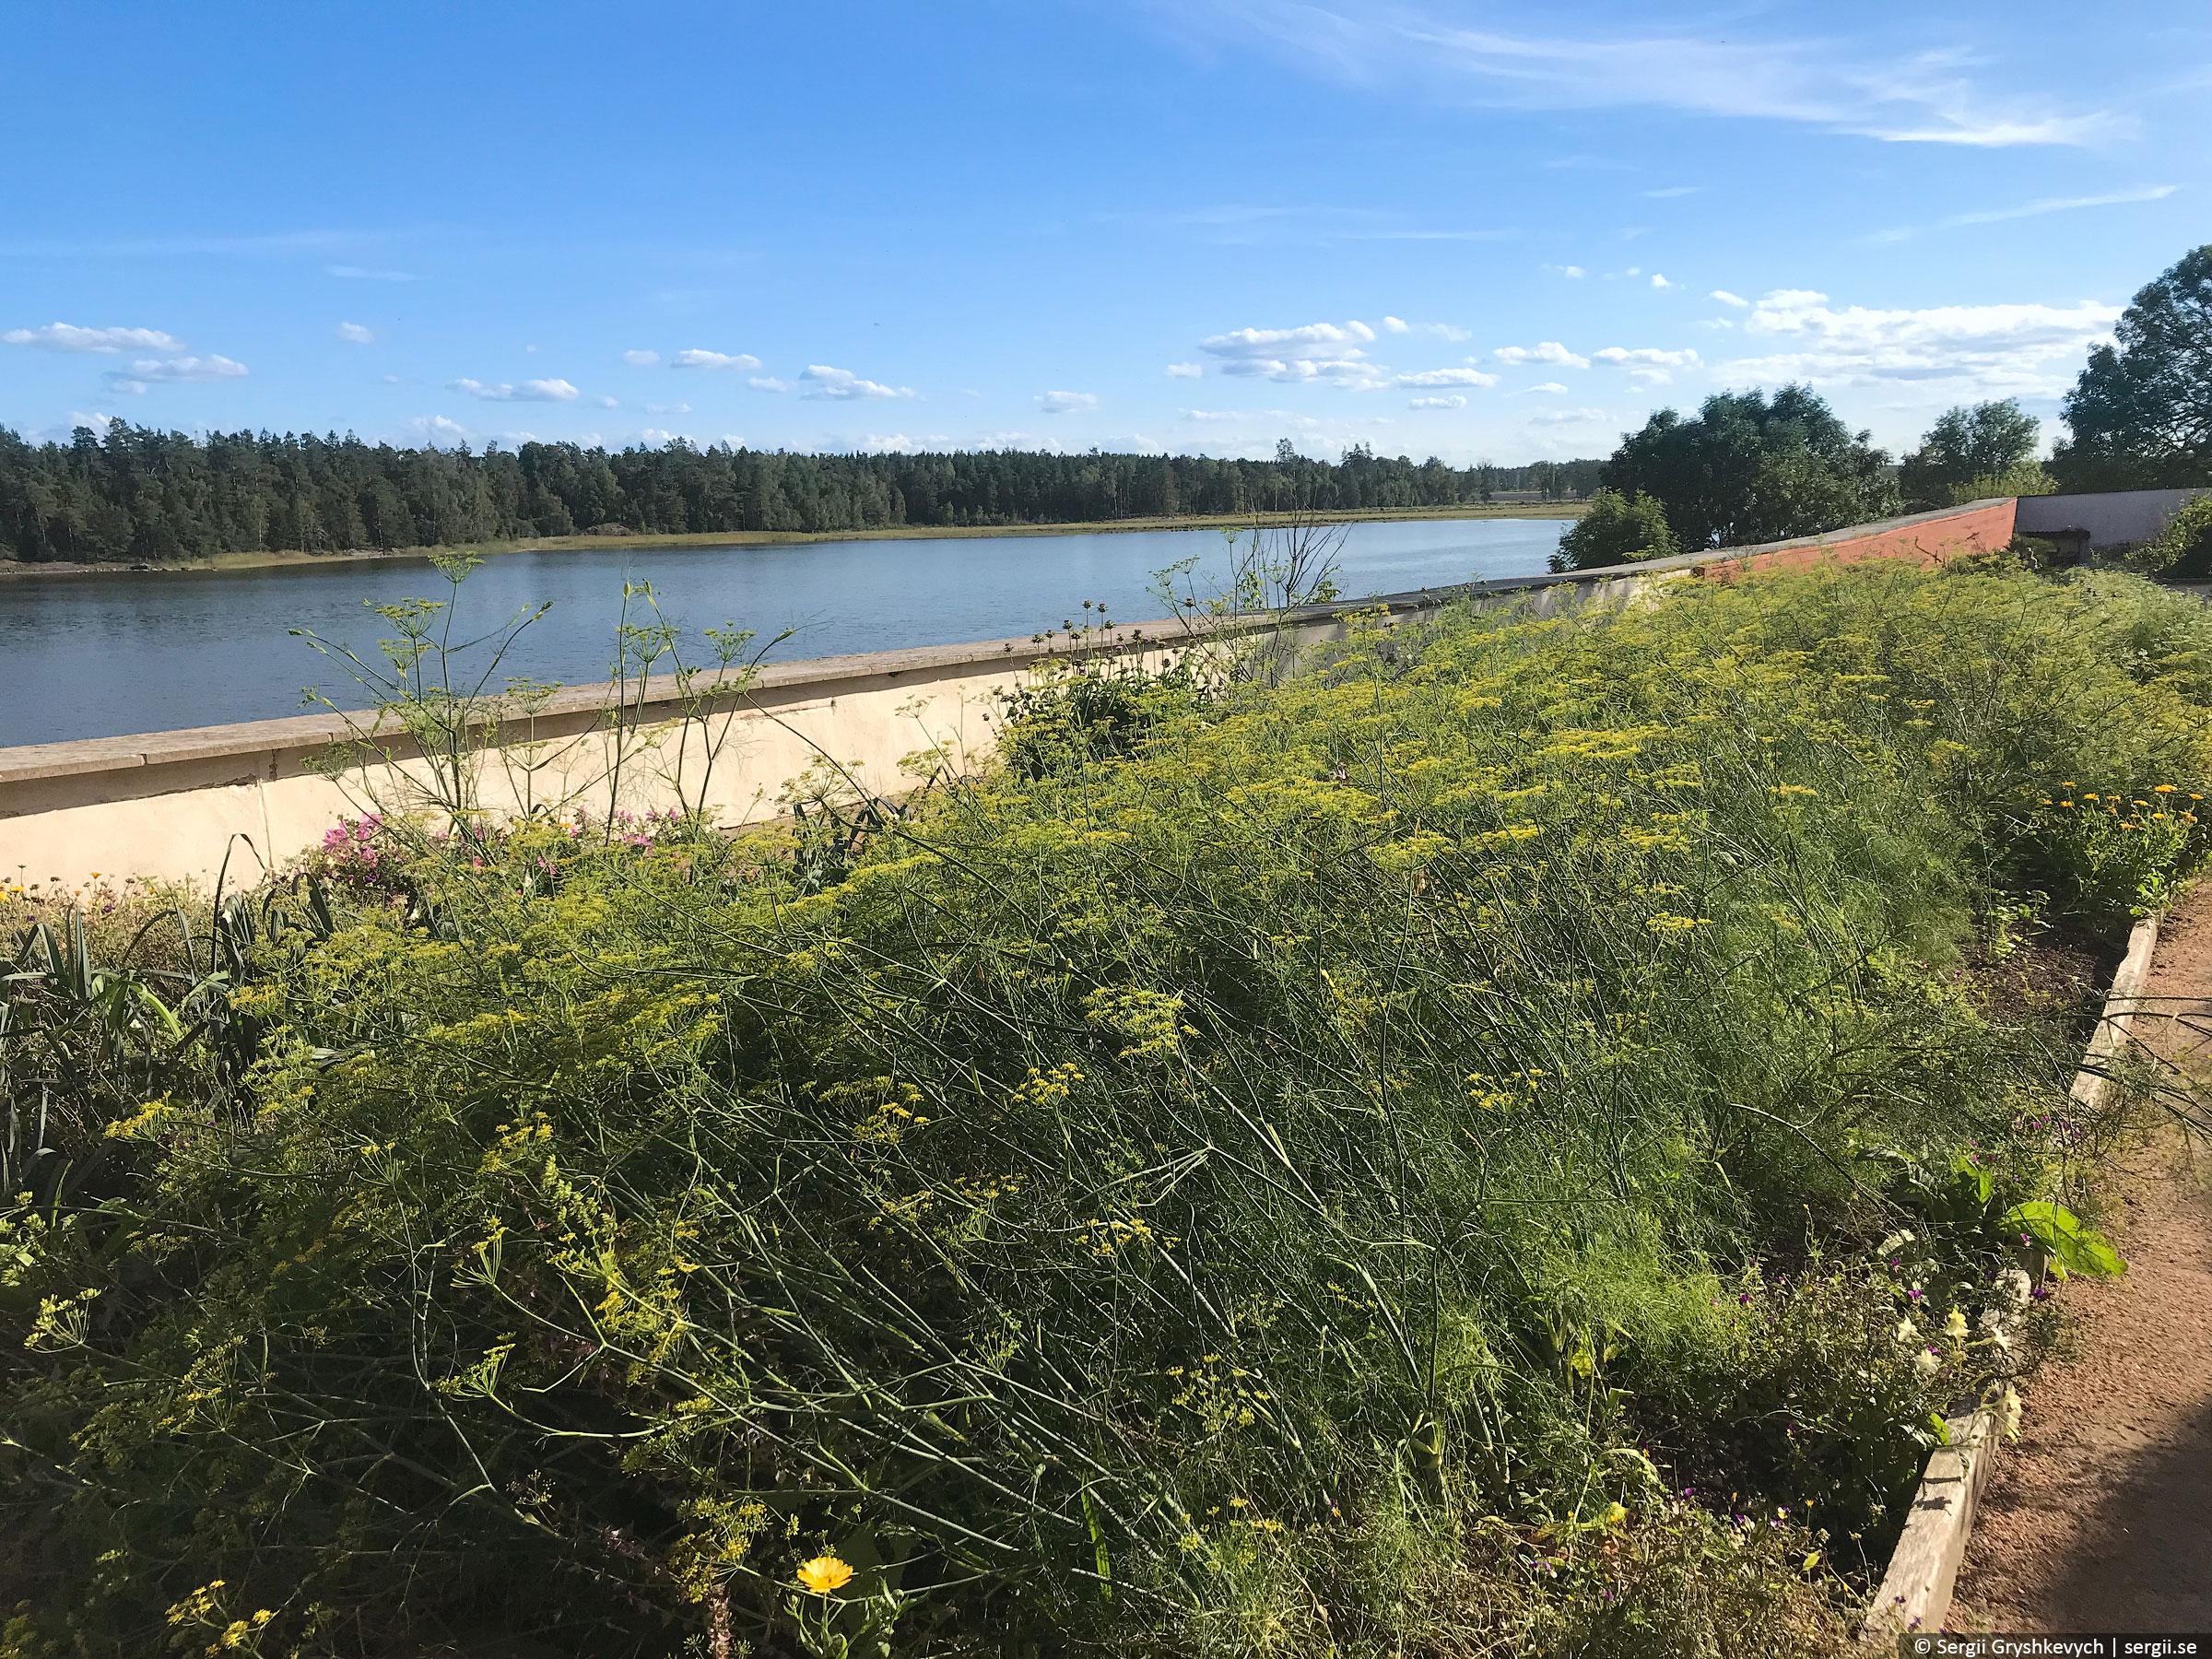 west-coast-sweden-2018-52